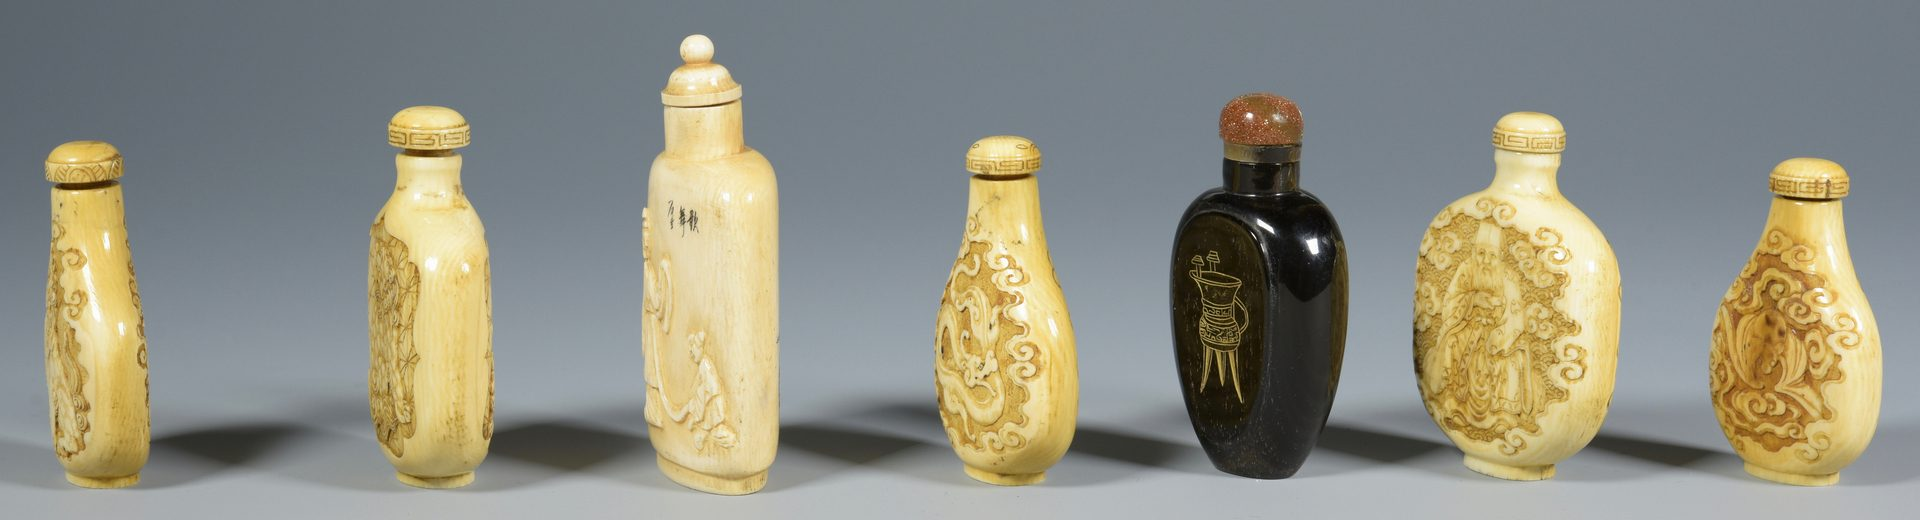 Lot 317: 7 Asian Snuff Bottles